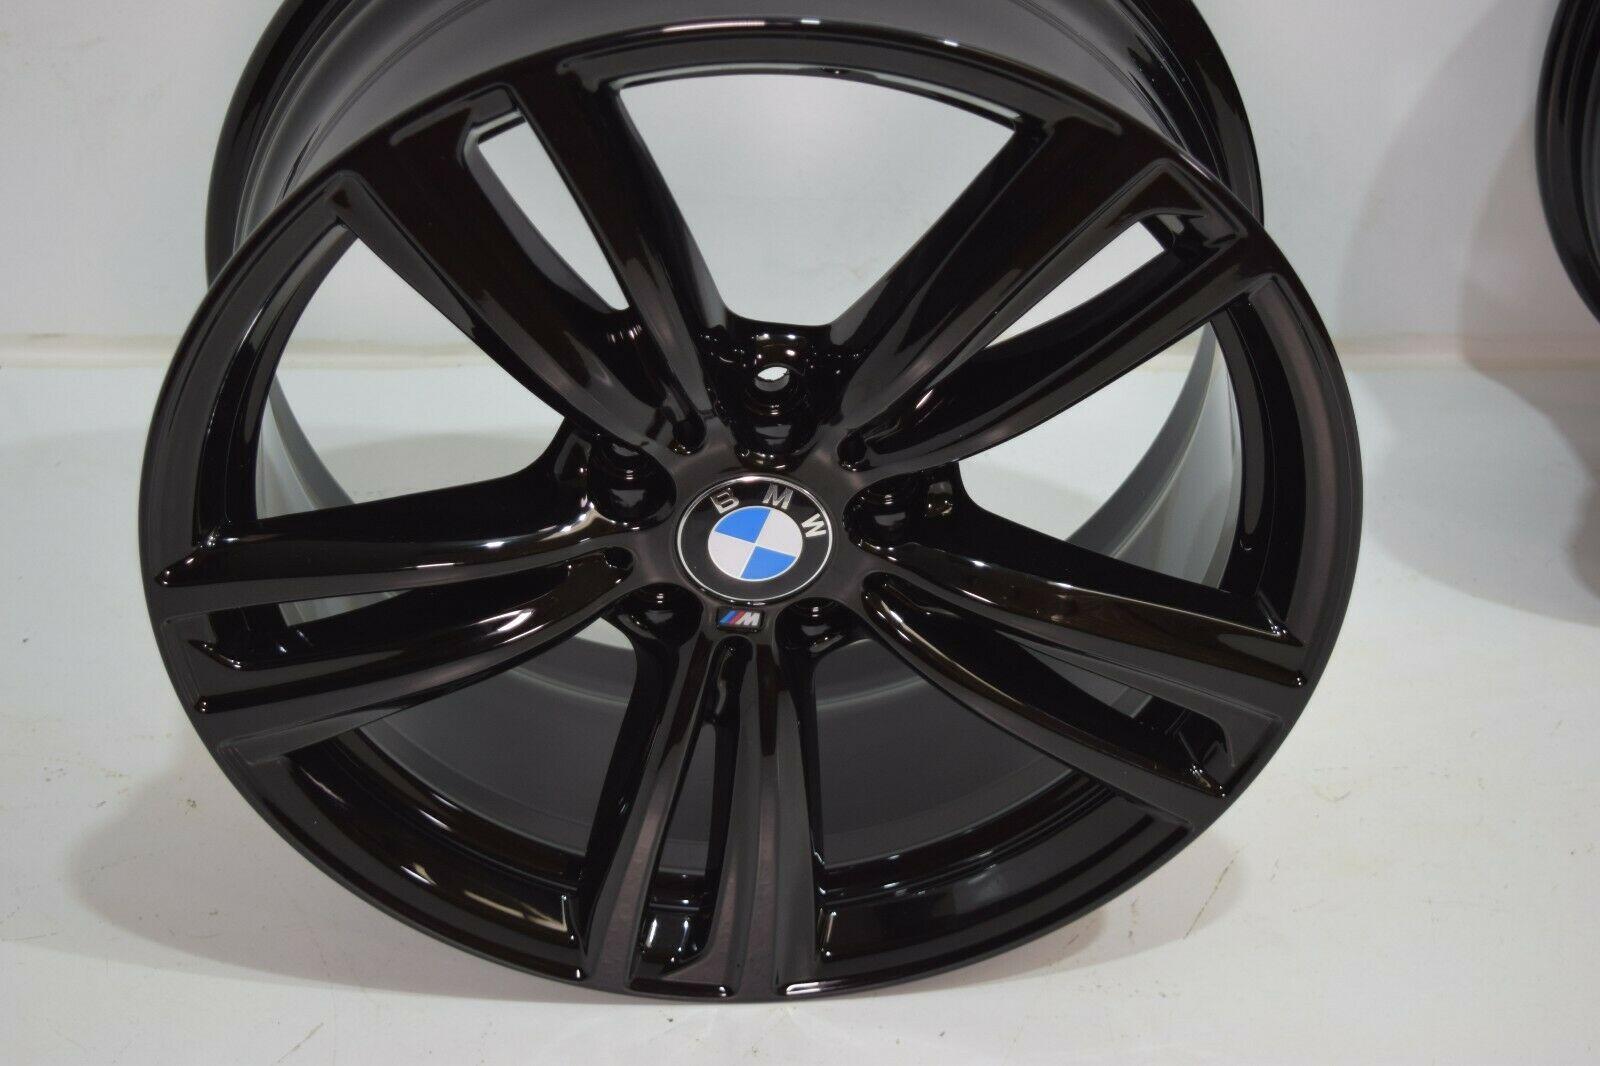 19 Bmw 335i 435i F32 4 3 Series F30 Oem M Sport 442 Rims Factory Black Factory Wheel Republic